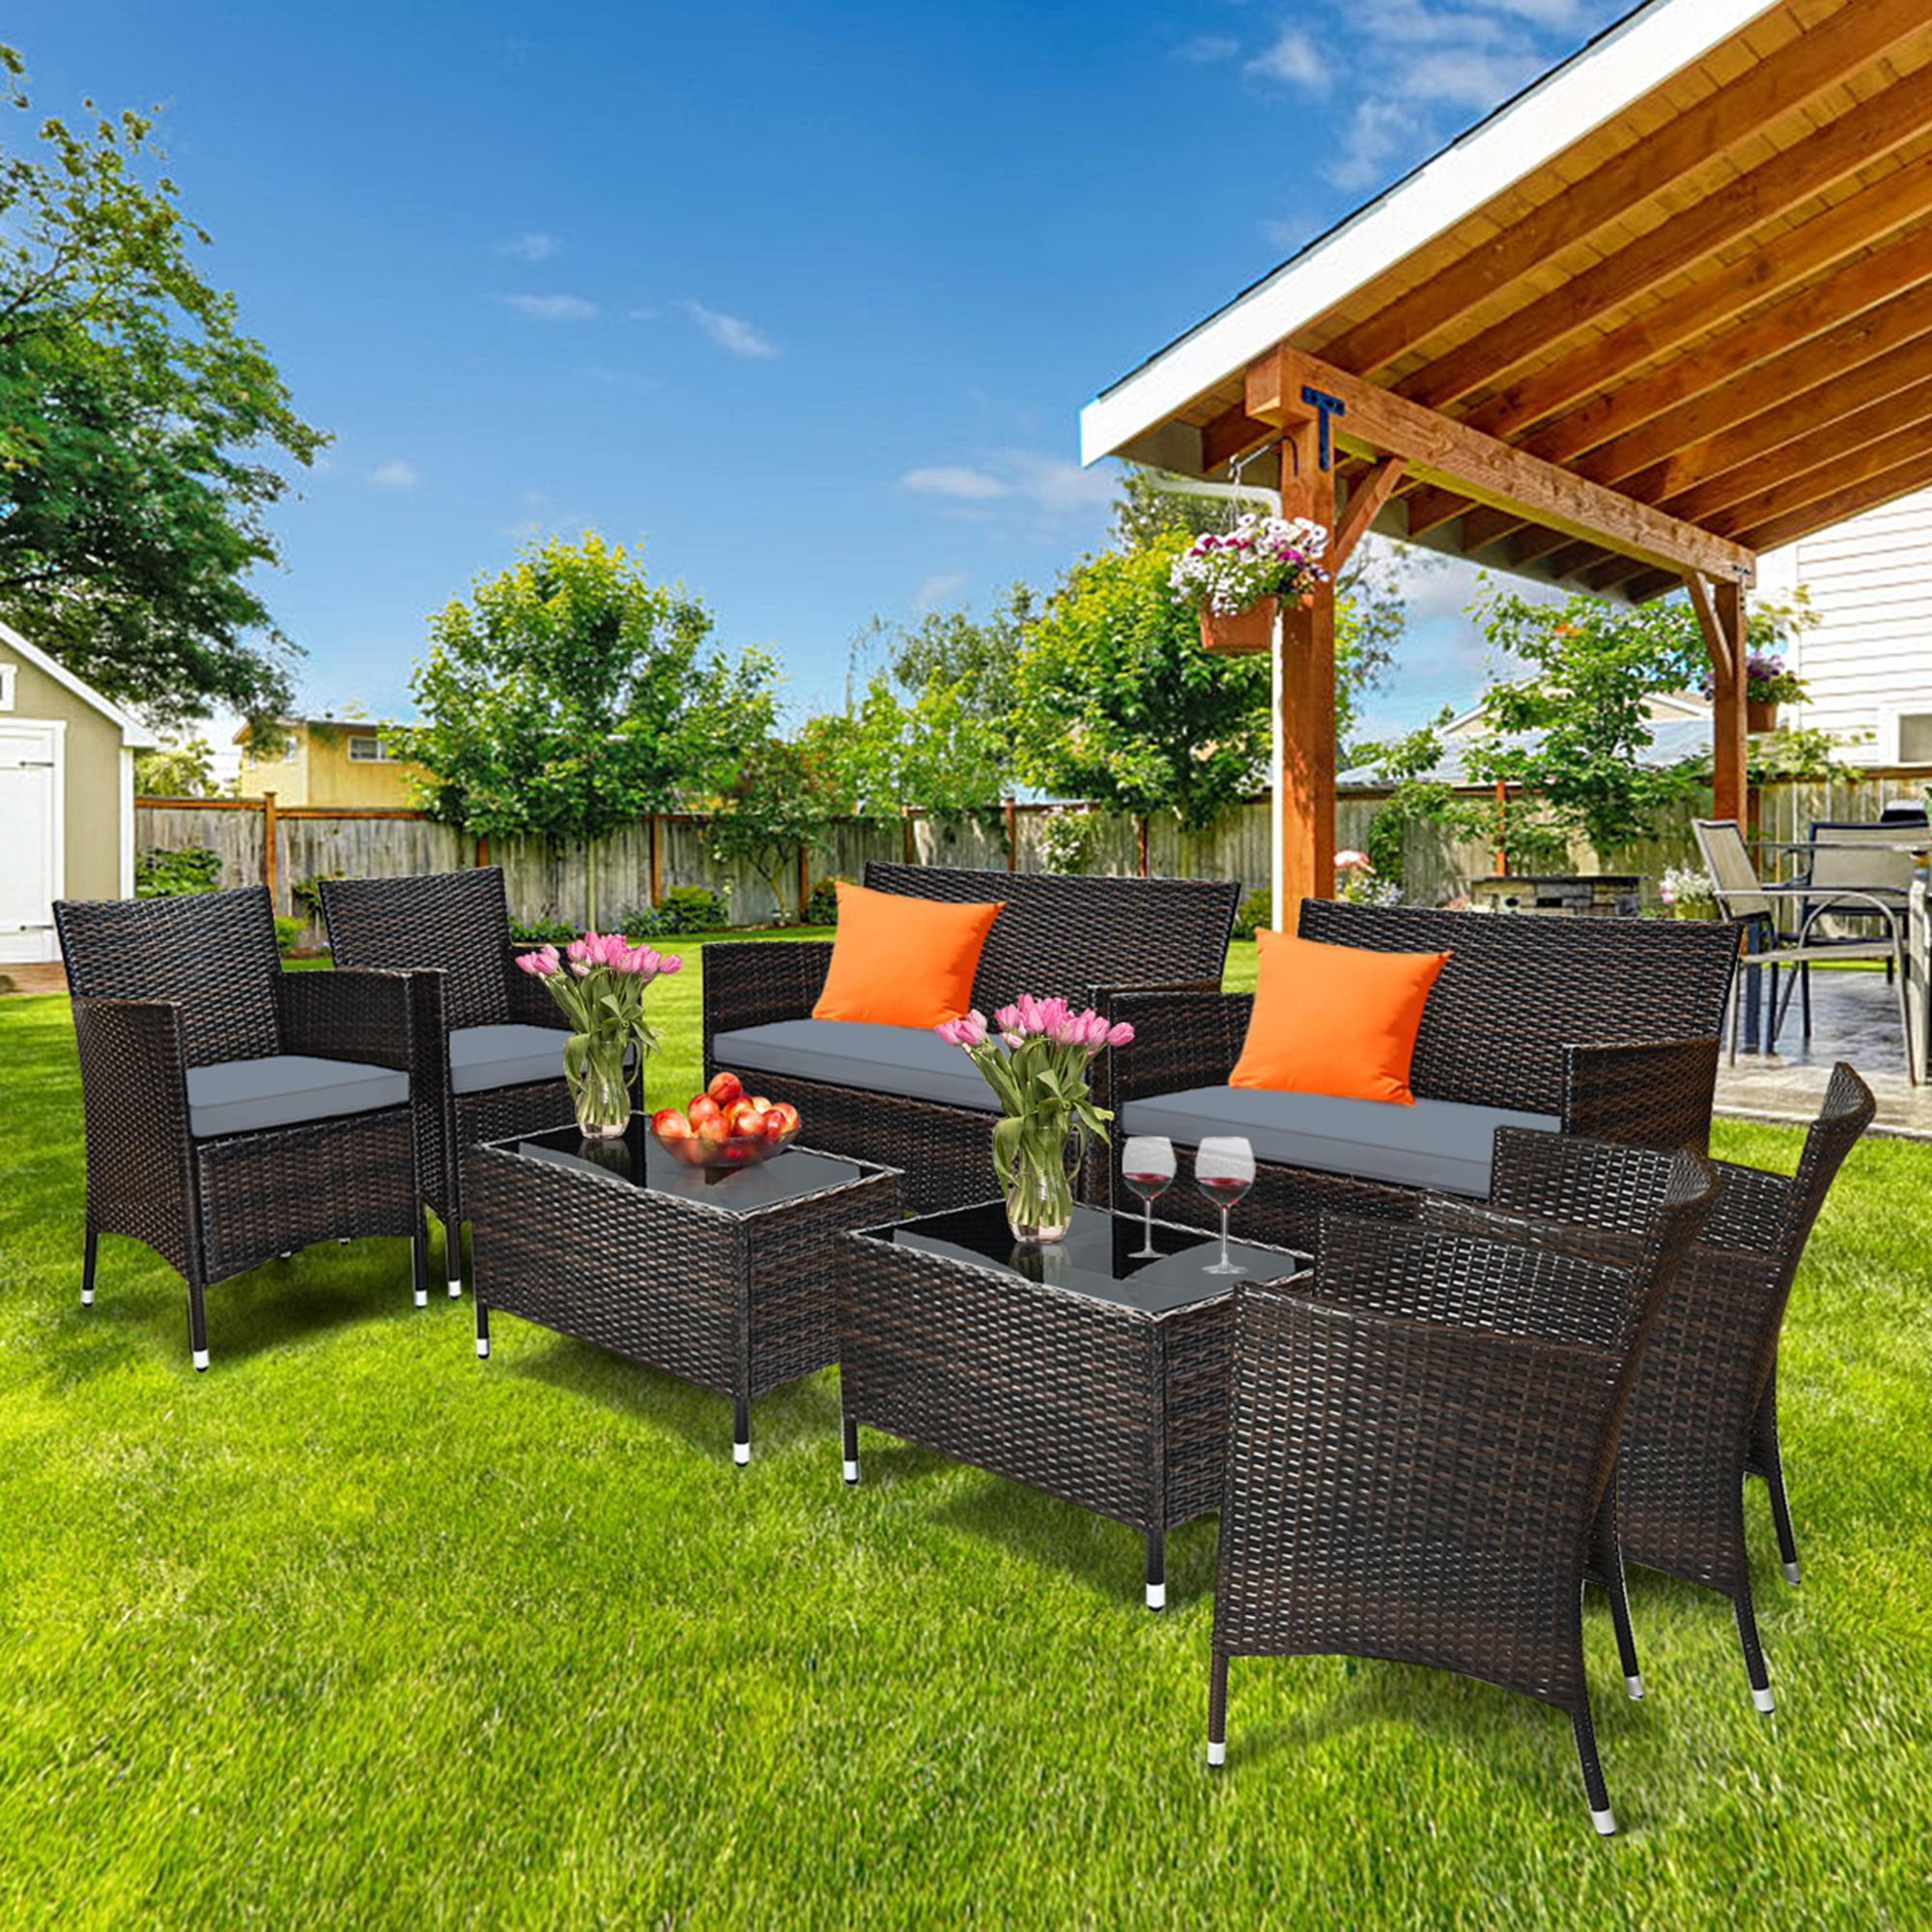 Gymax 8PCS Patio Rattan Conversation Furniture Set Outdoor ...